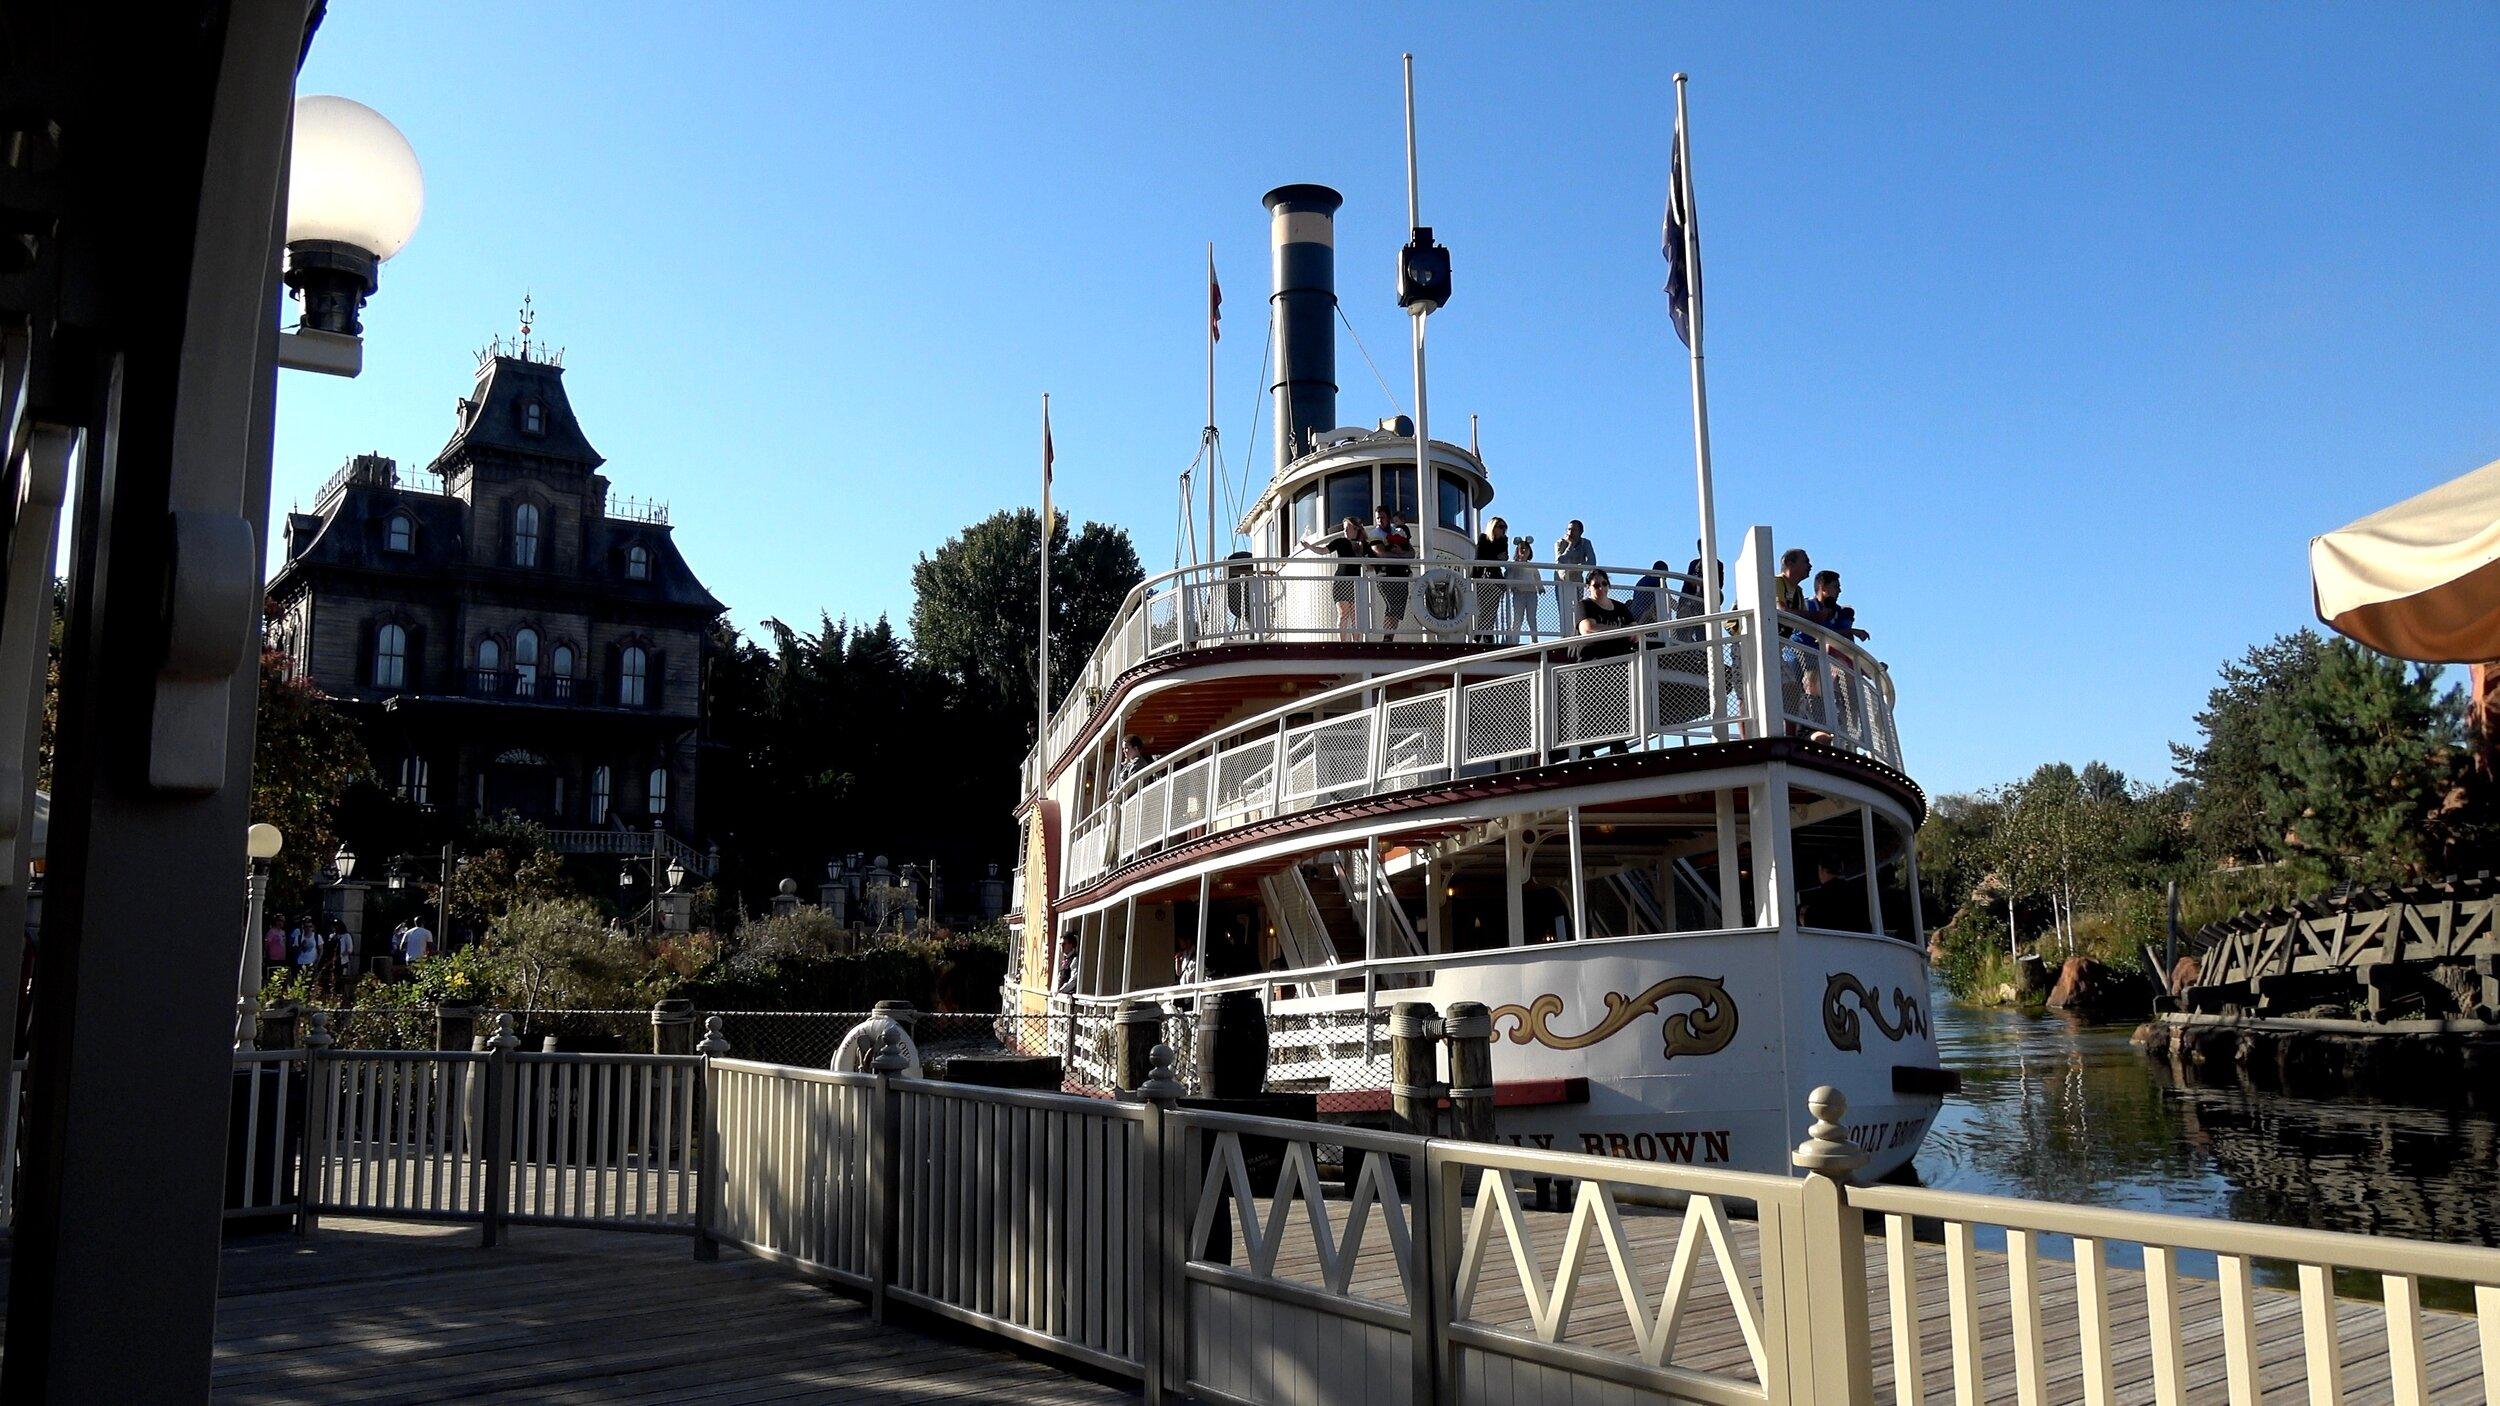 No Restrooms on this boat at Disneyland Paris.jpg